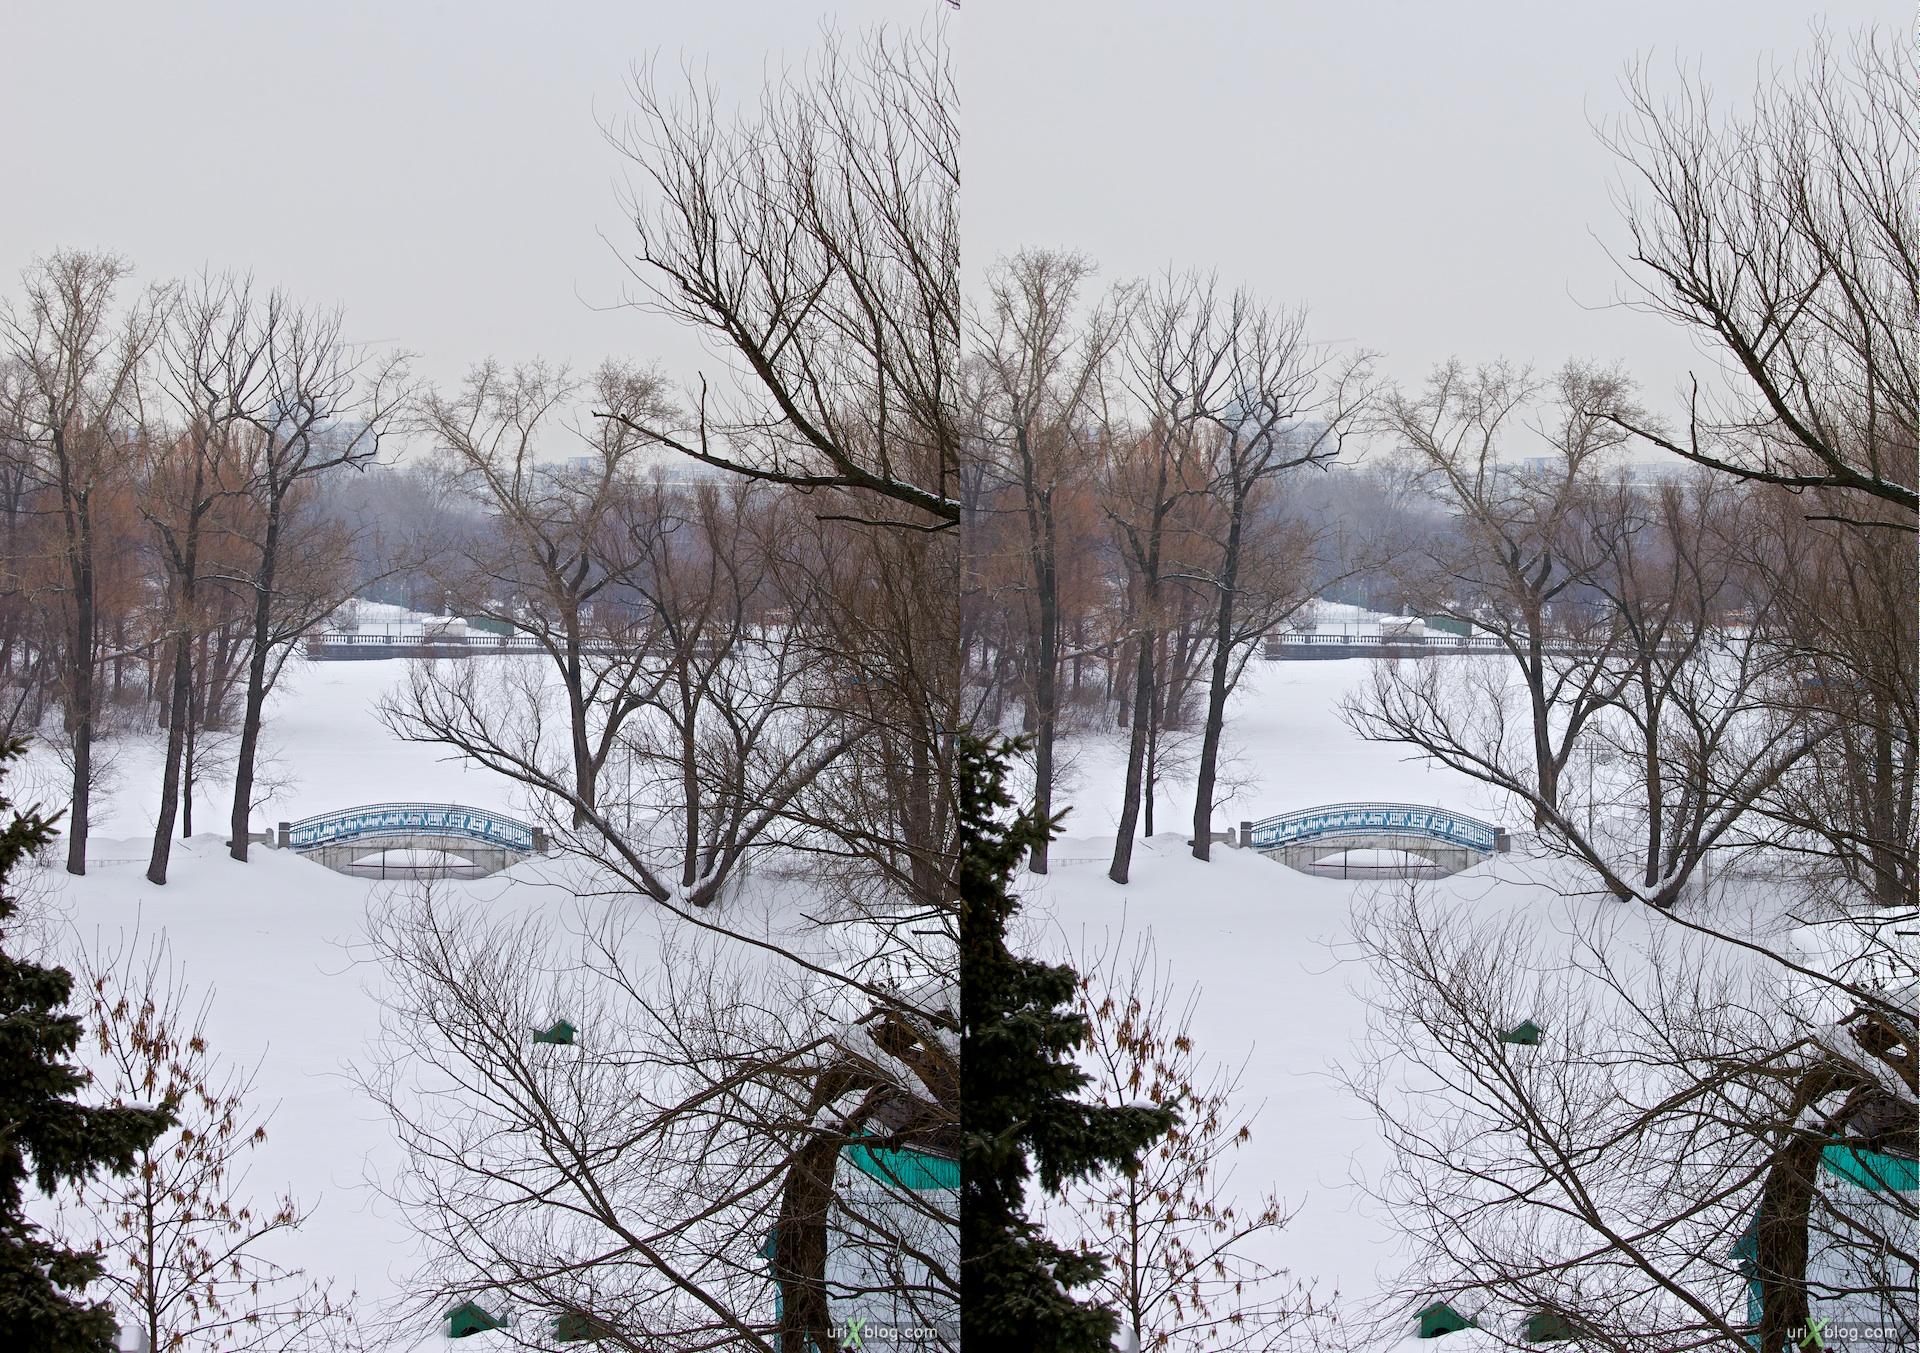 2010 3D, stereo, cross-eyed, стерео, стереопара Москва Андреевский мост парк Горького